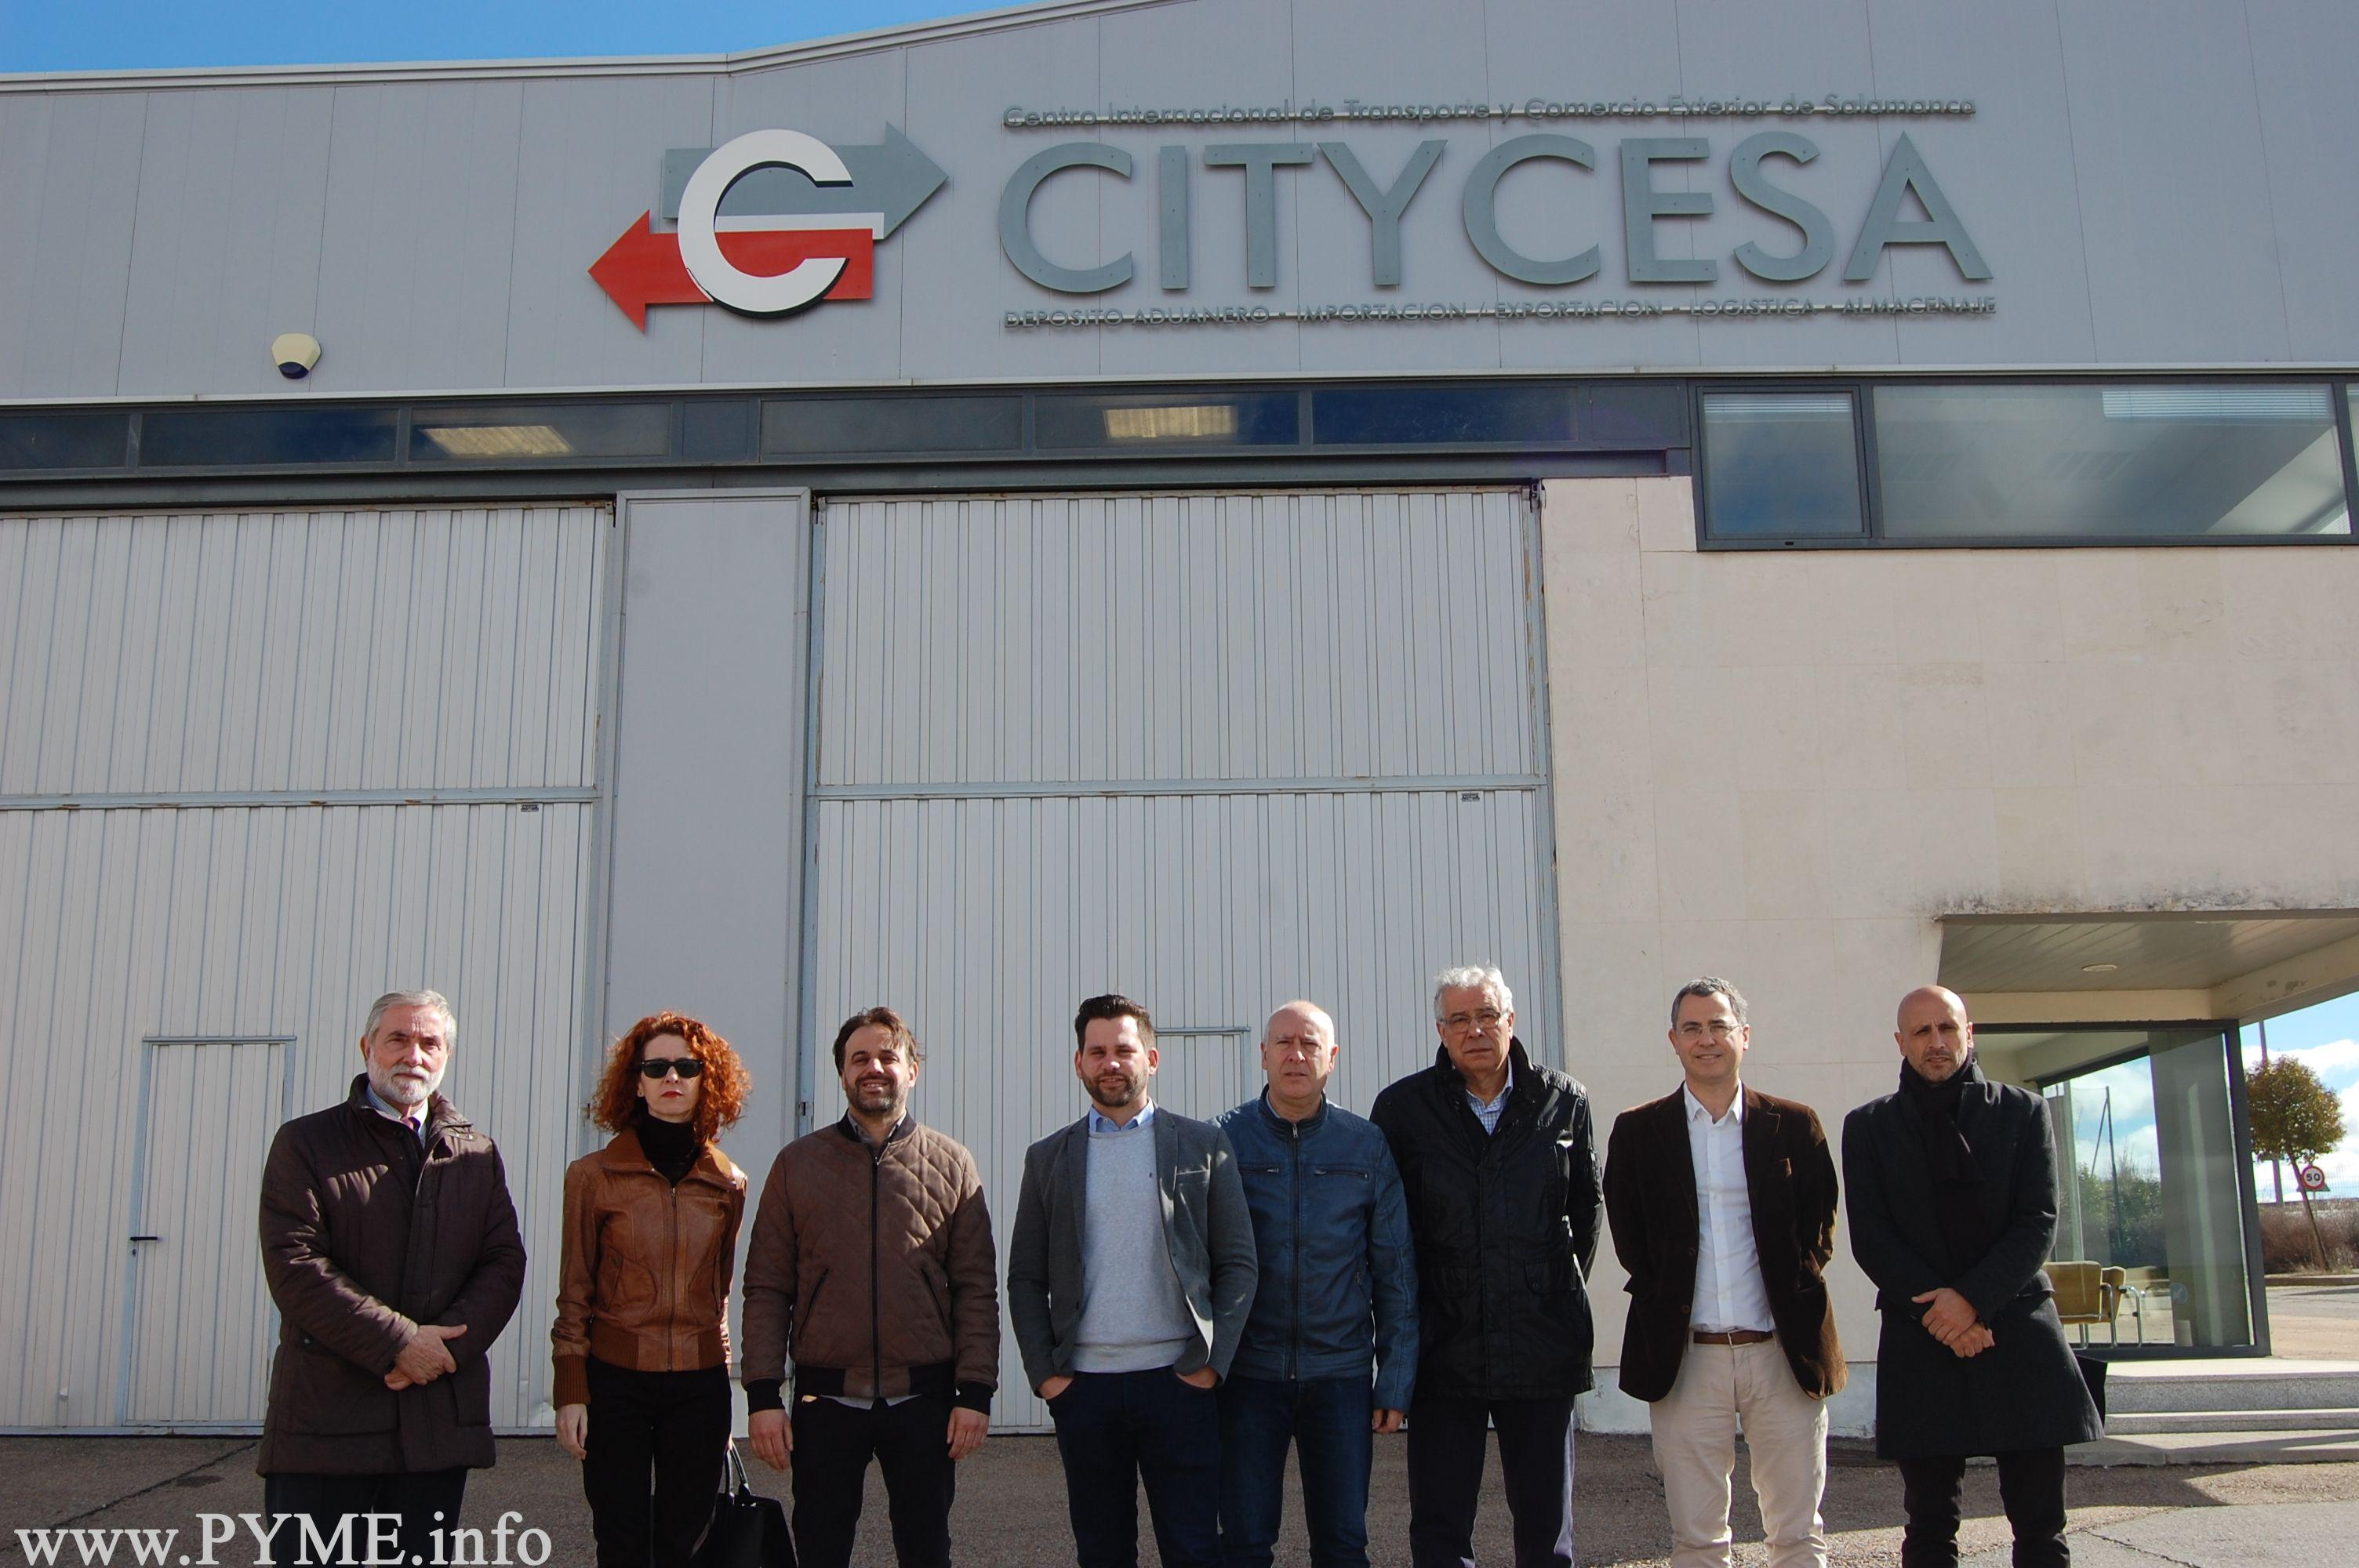 citycesa_c's